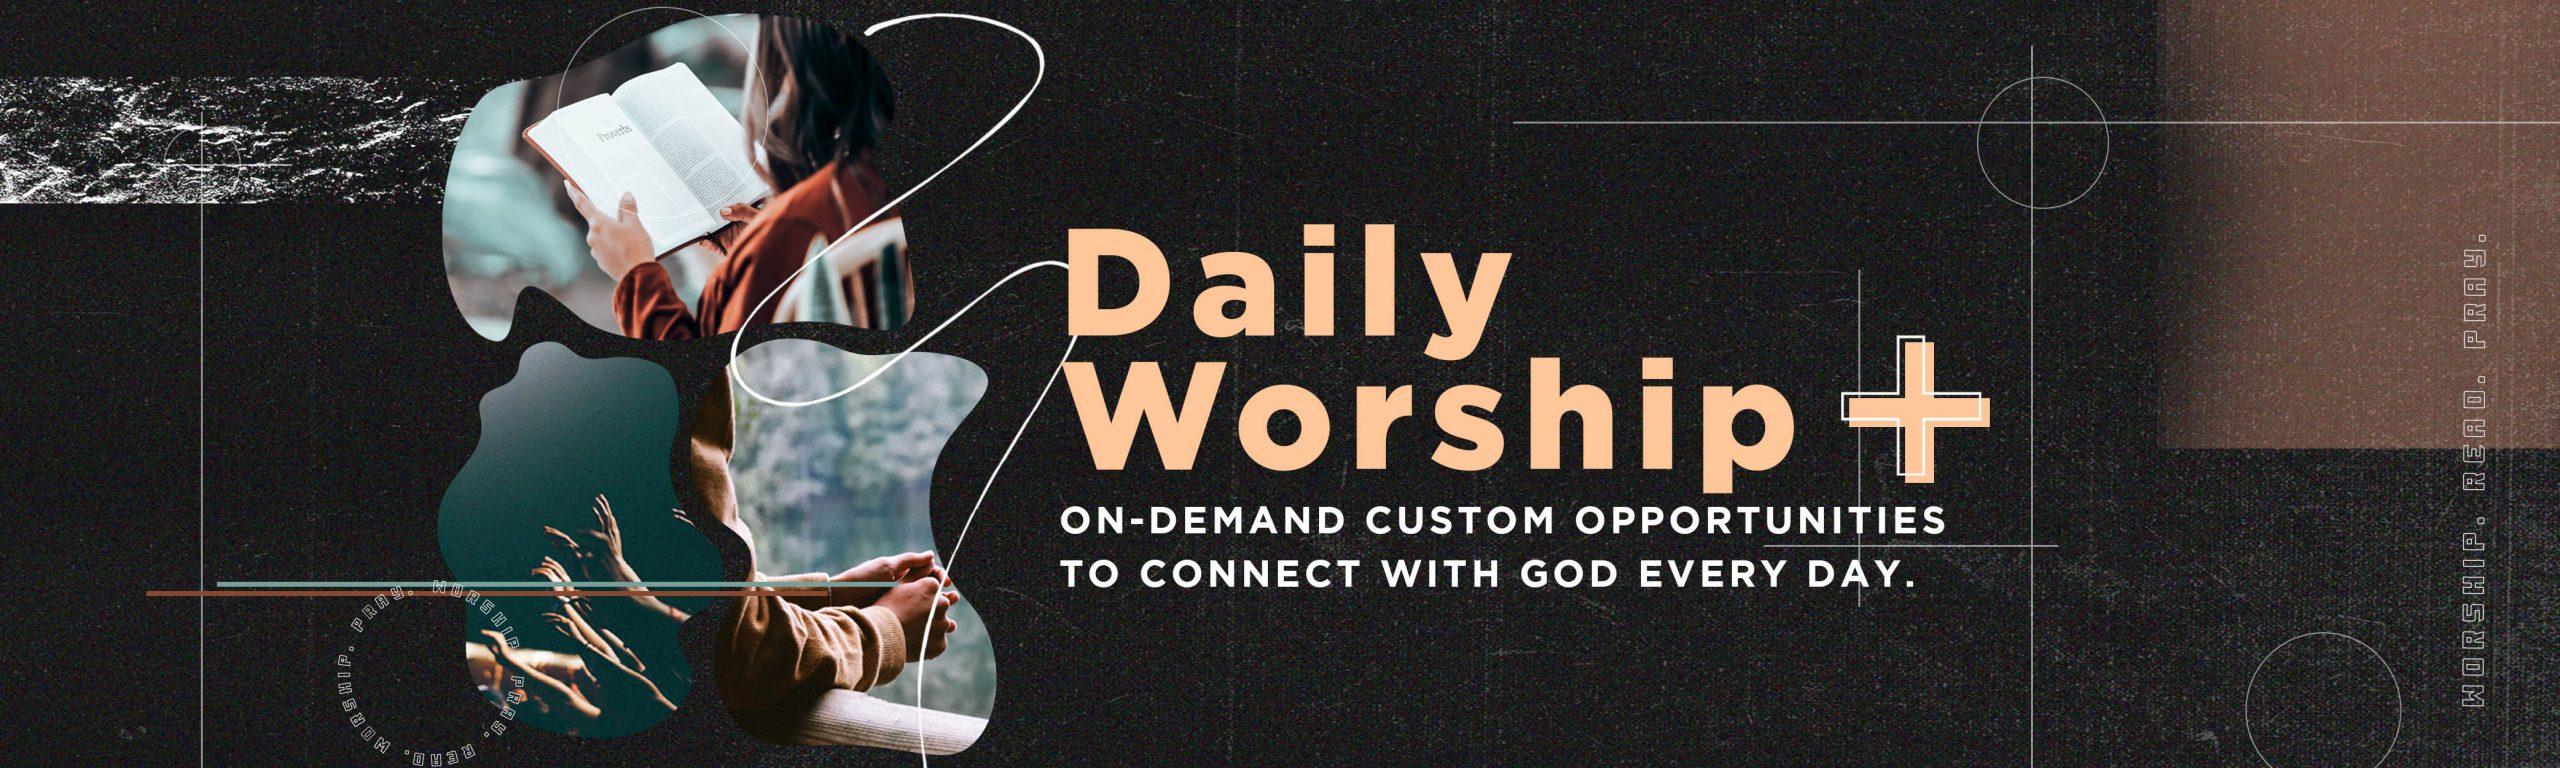 Daily Worship+